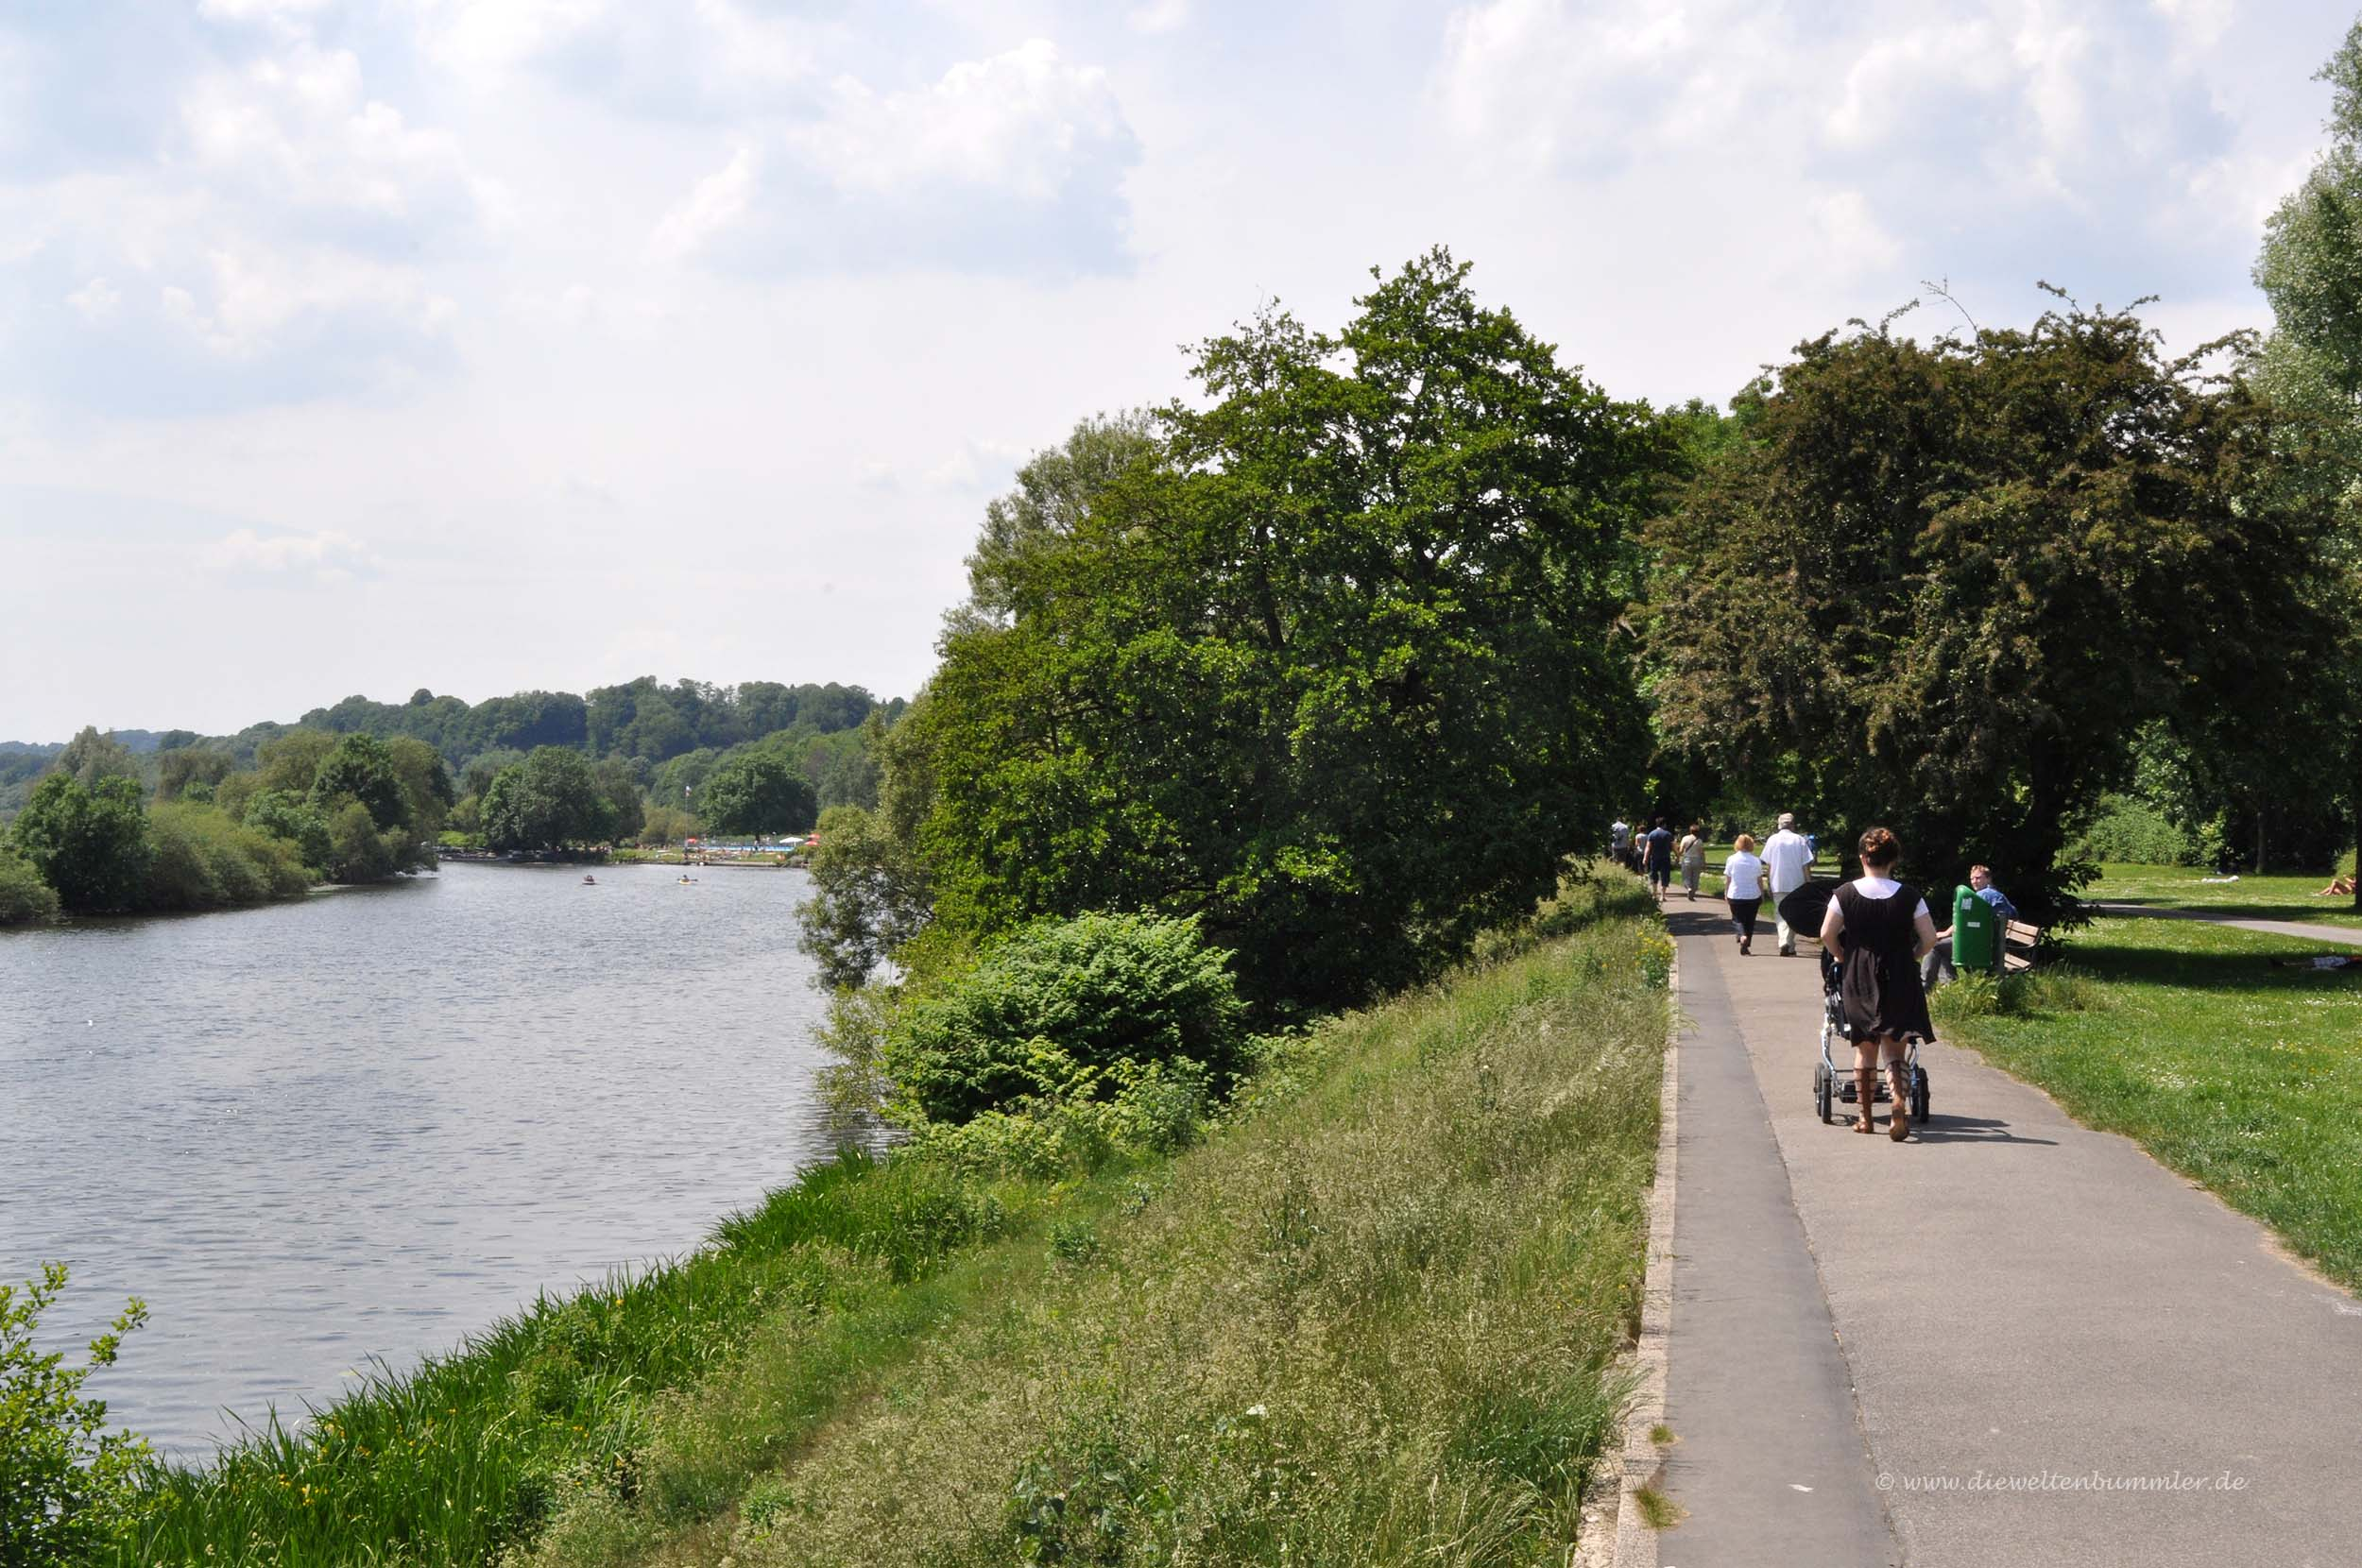 Weg am Ruhrufer in Essen-Steele